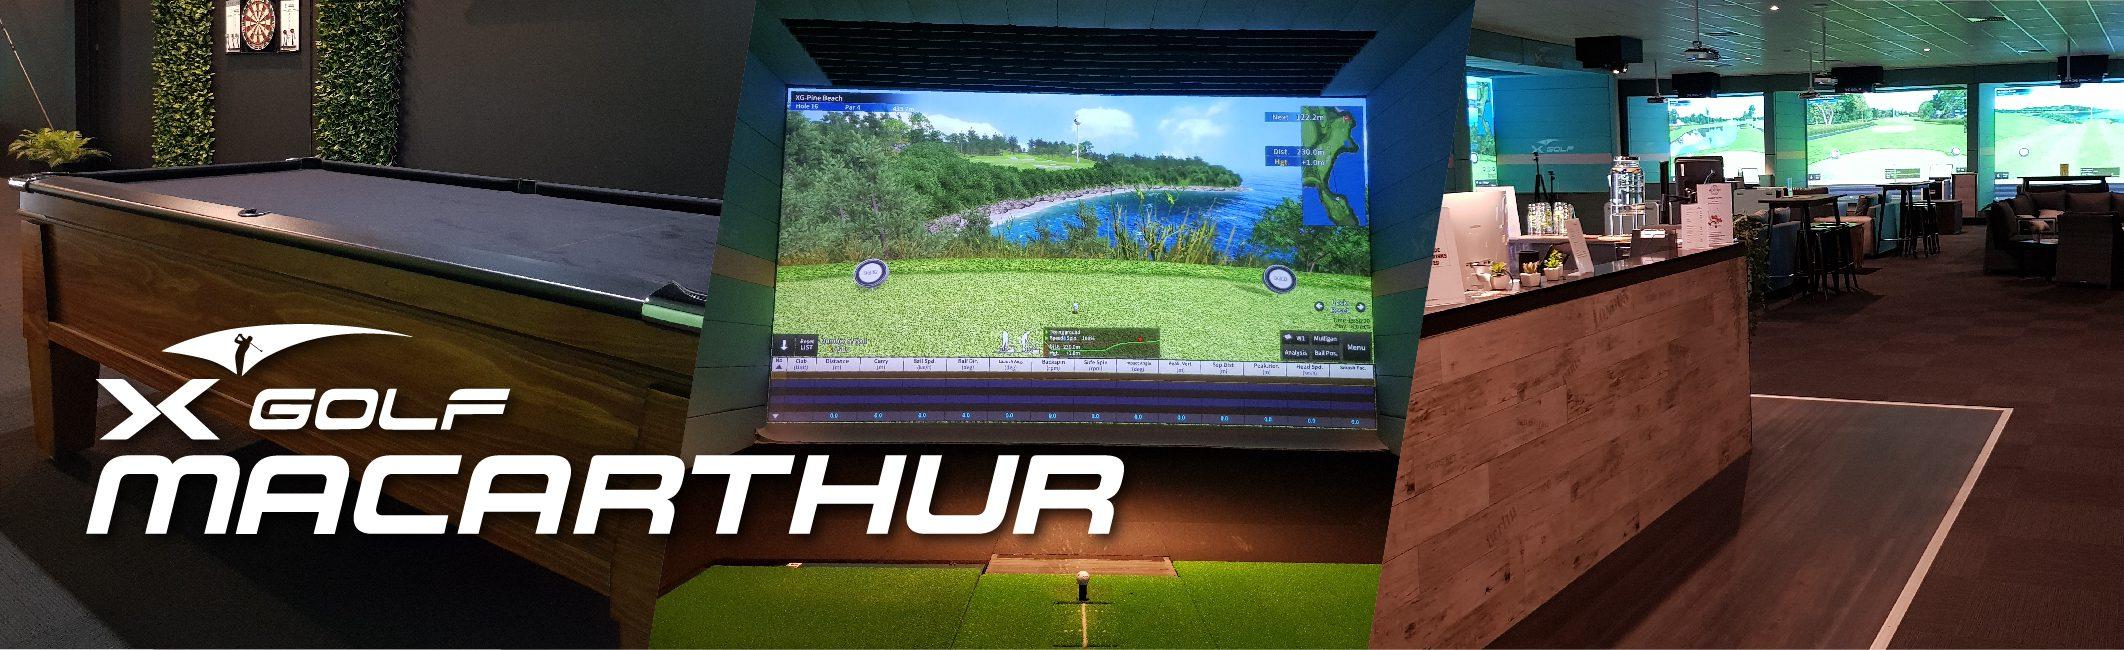 X-Golf Macarthur Page Header